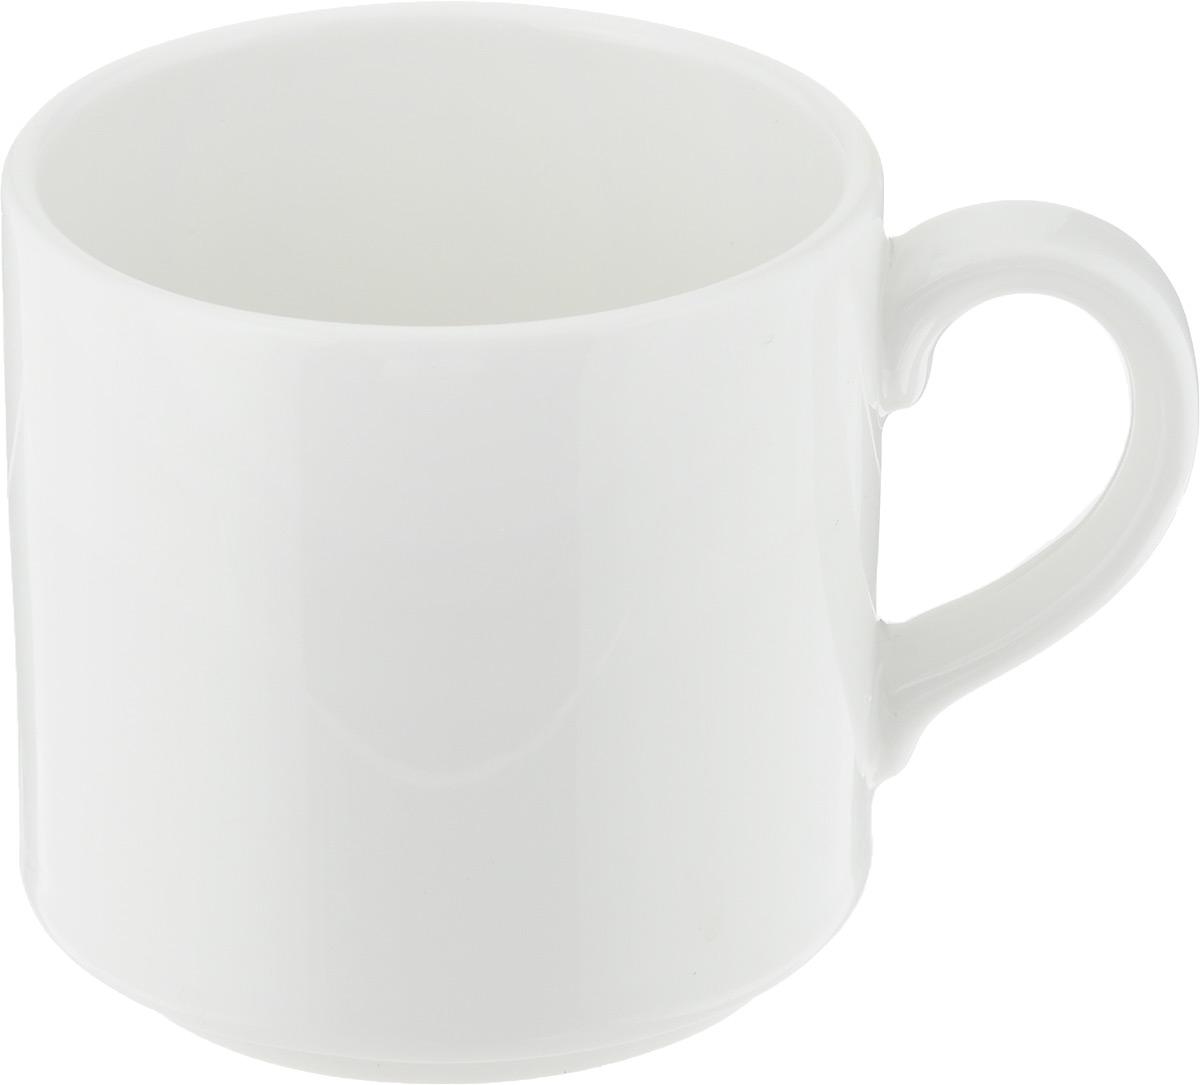 Фото - Чашка чайная Ariane Прайм, 200 мл чашка чайная ariane прайм 230 мл